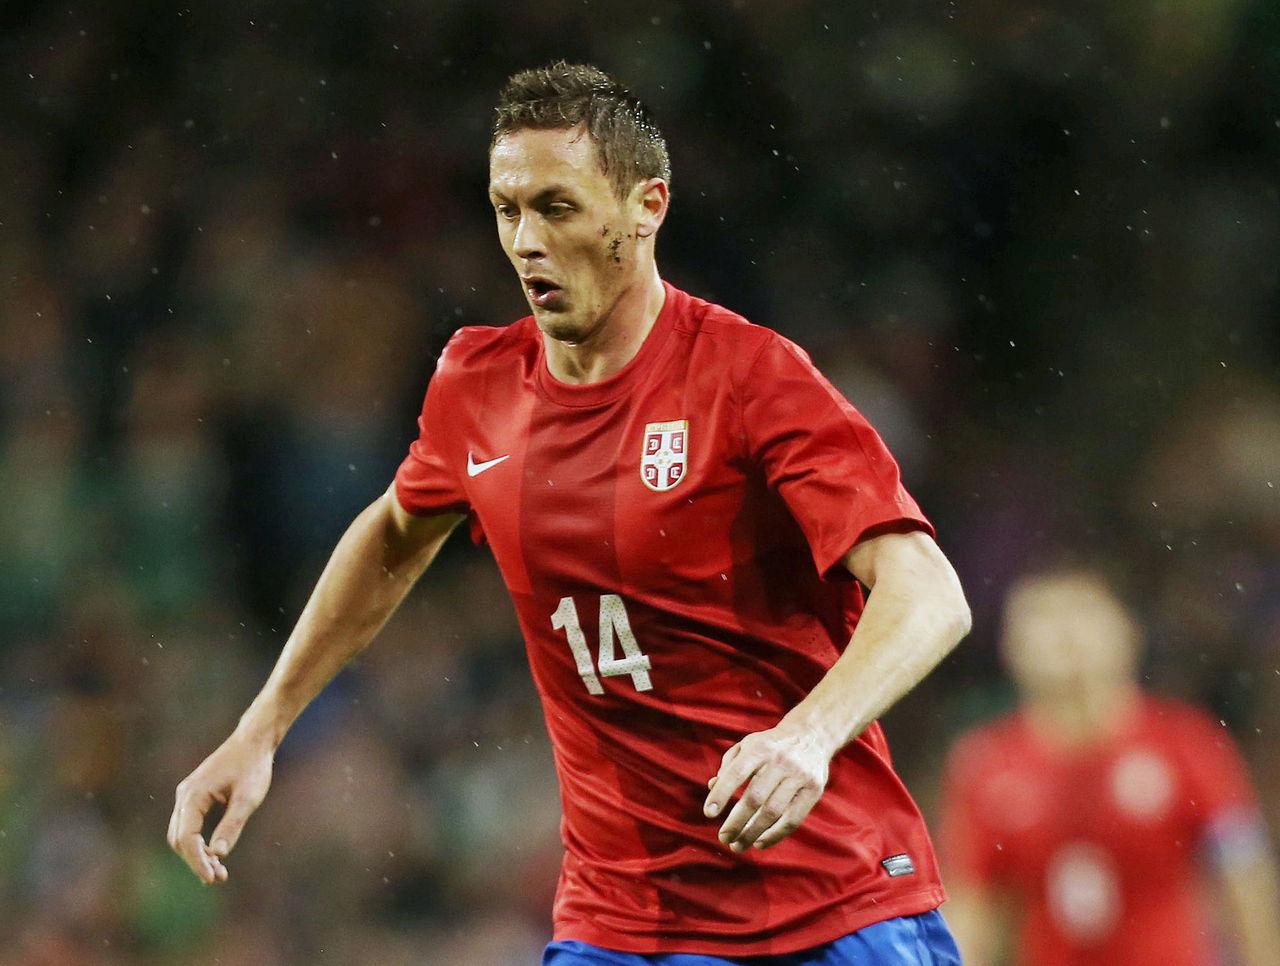 Nemanja Matic threatens to quit Serbian national team